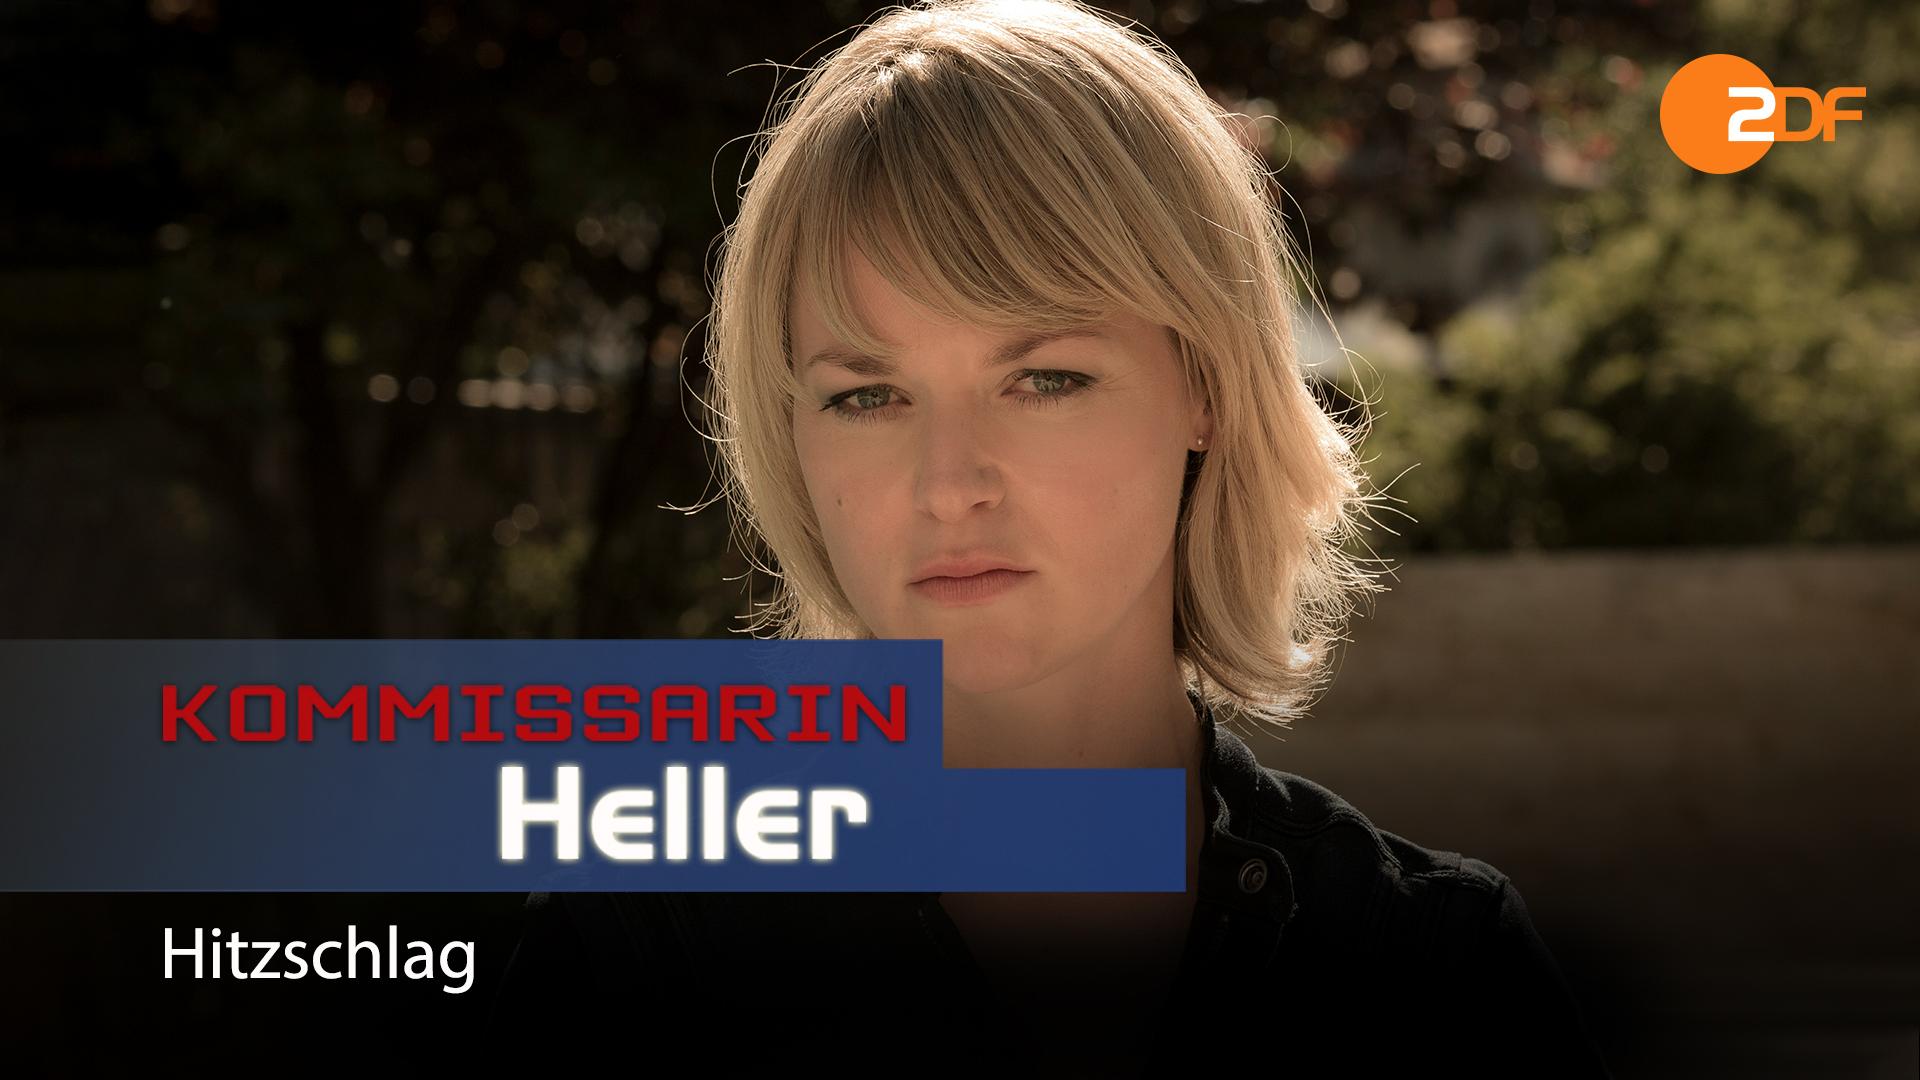 Kommissarin Heller 10 Folgen Episodenguide Fernsehserien De